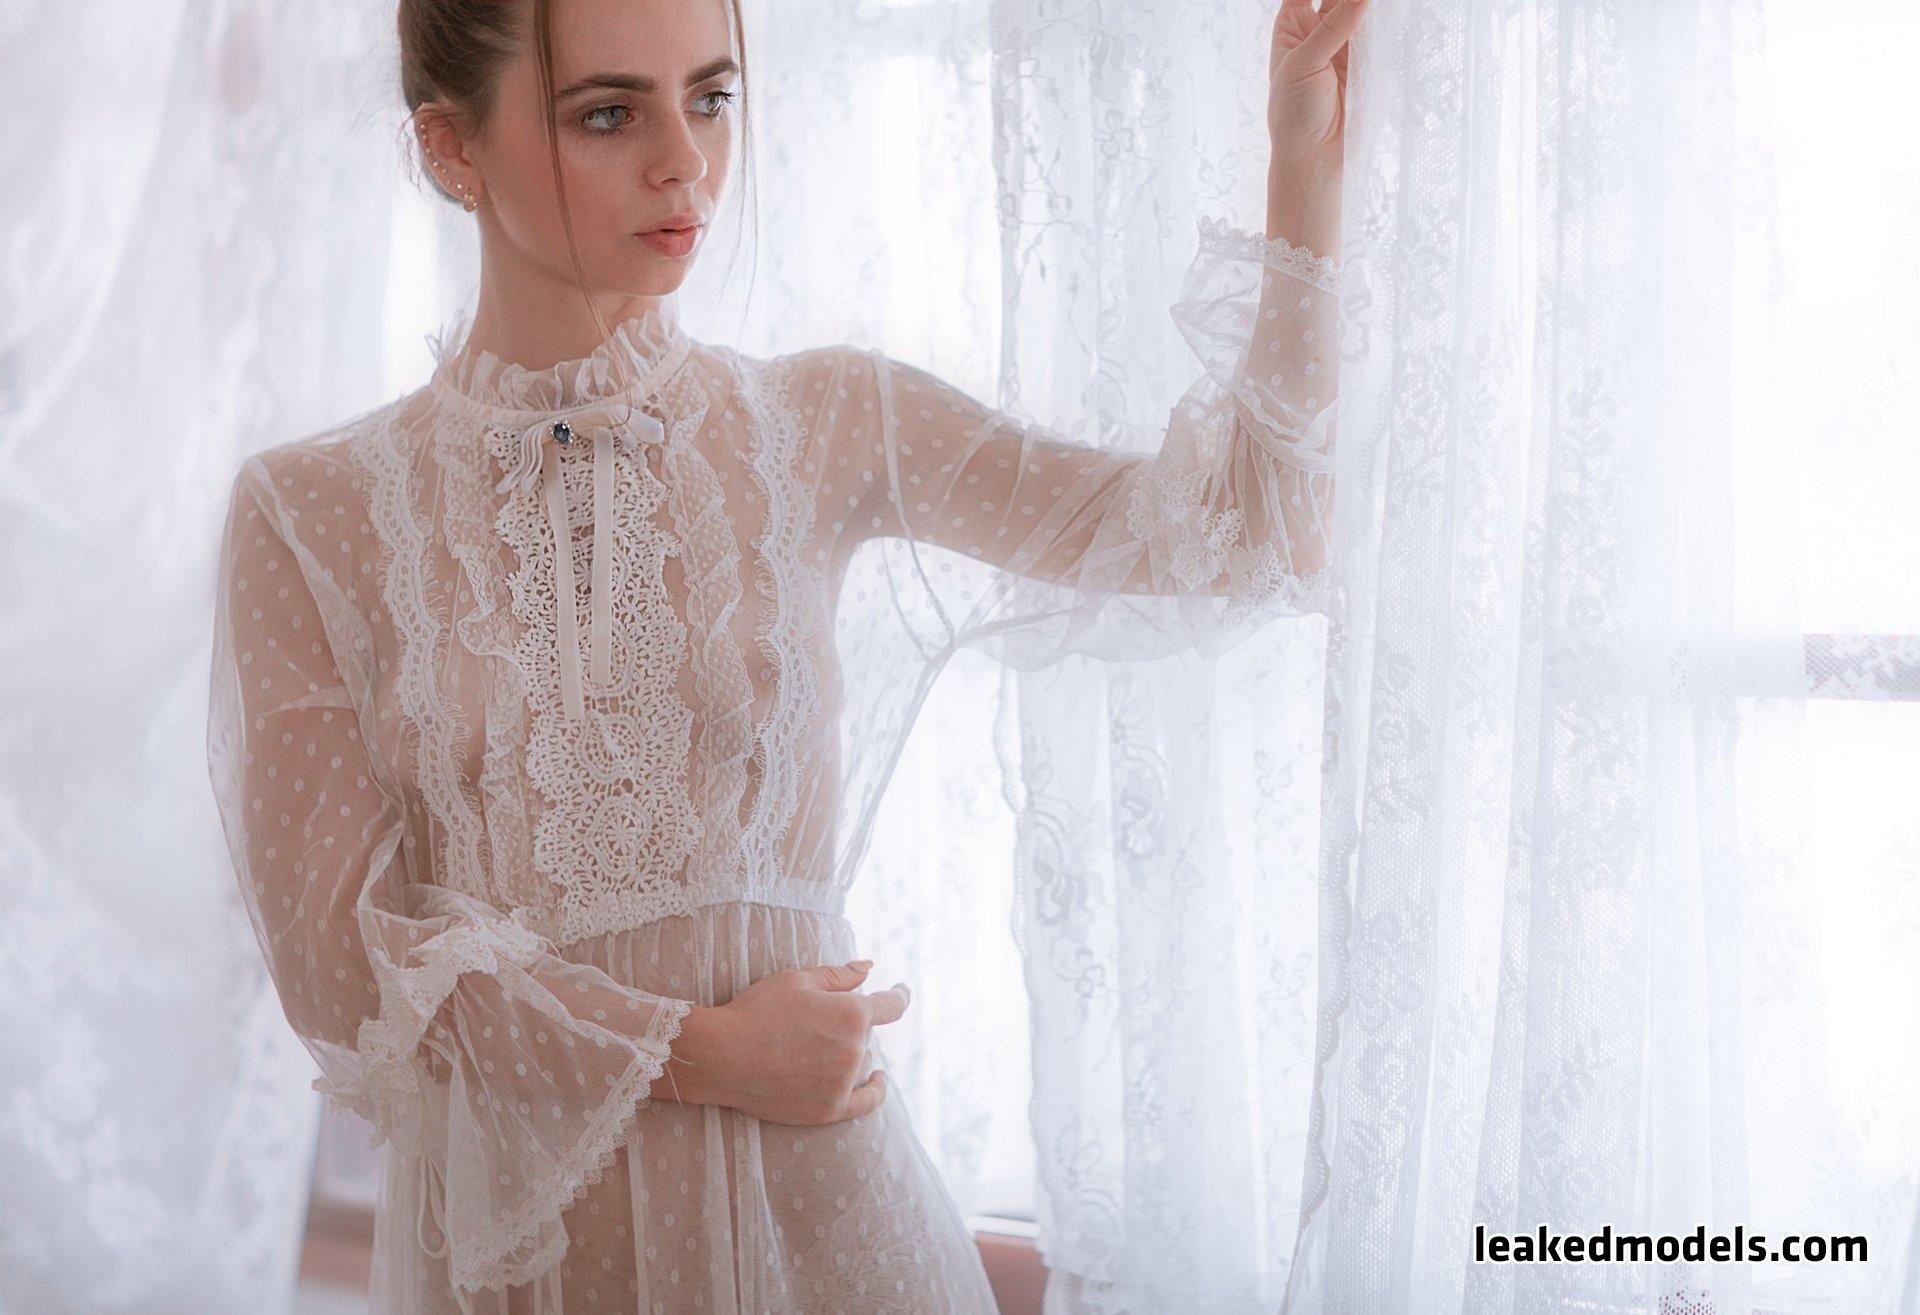 Kamila Salkova – kamila_salkova Instagram Nude Leaks (35 Photos)